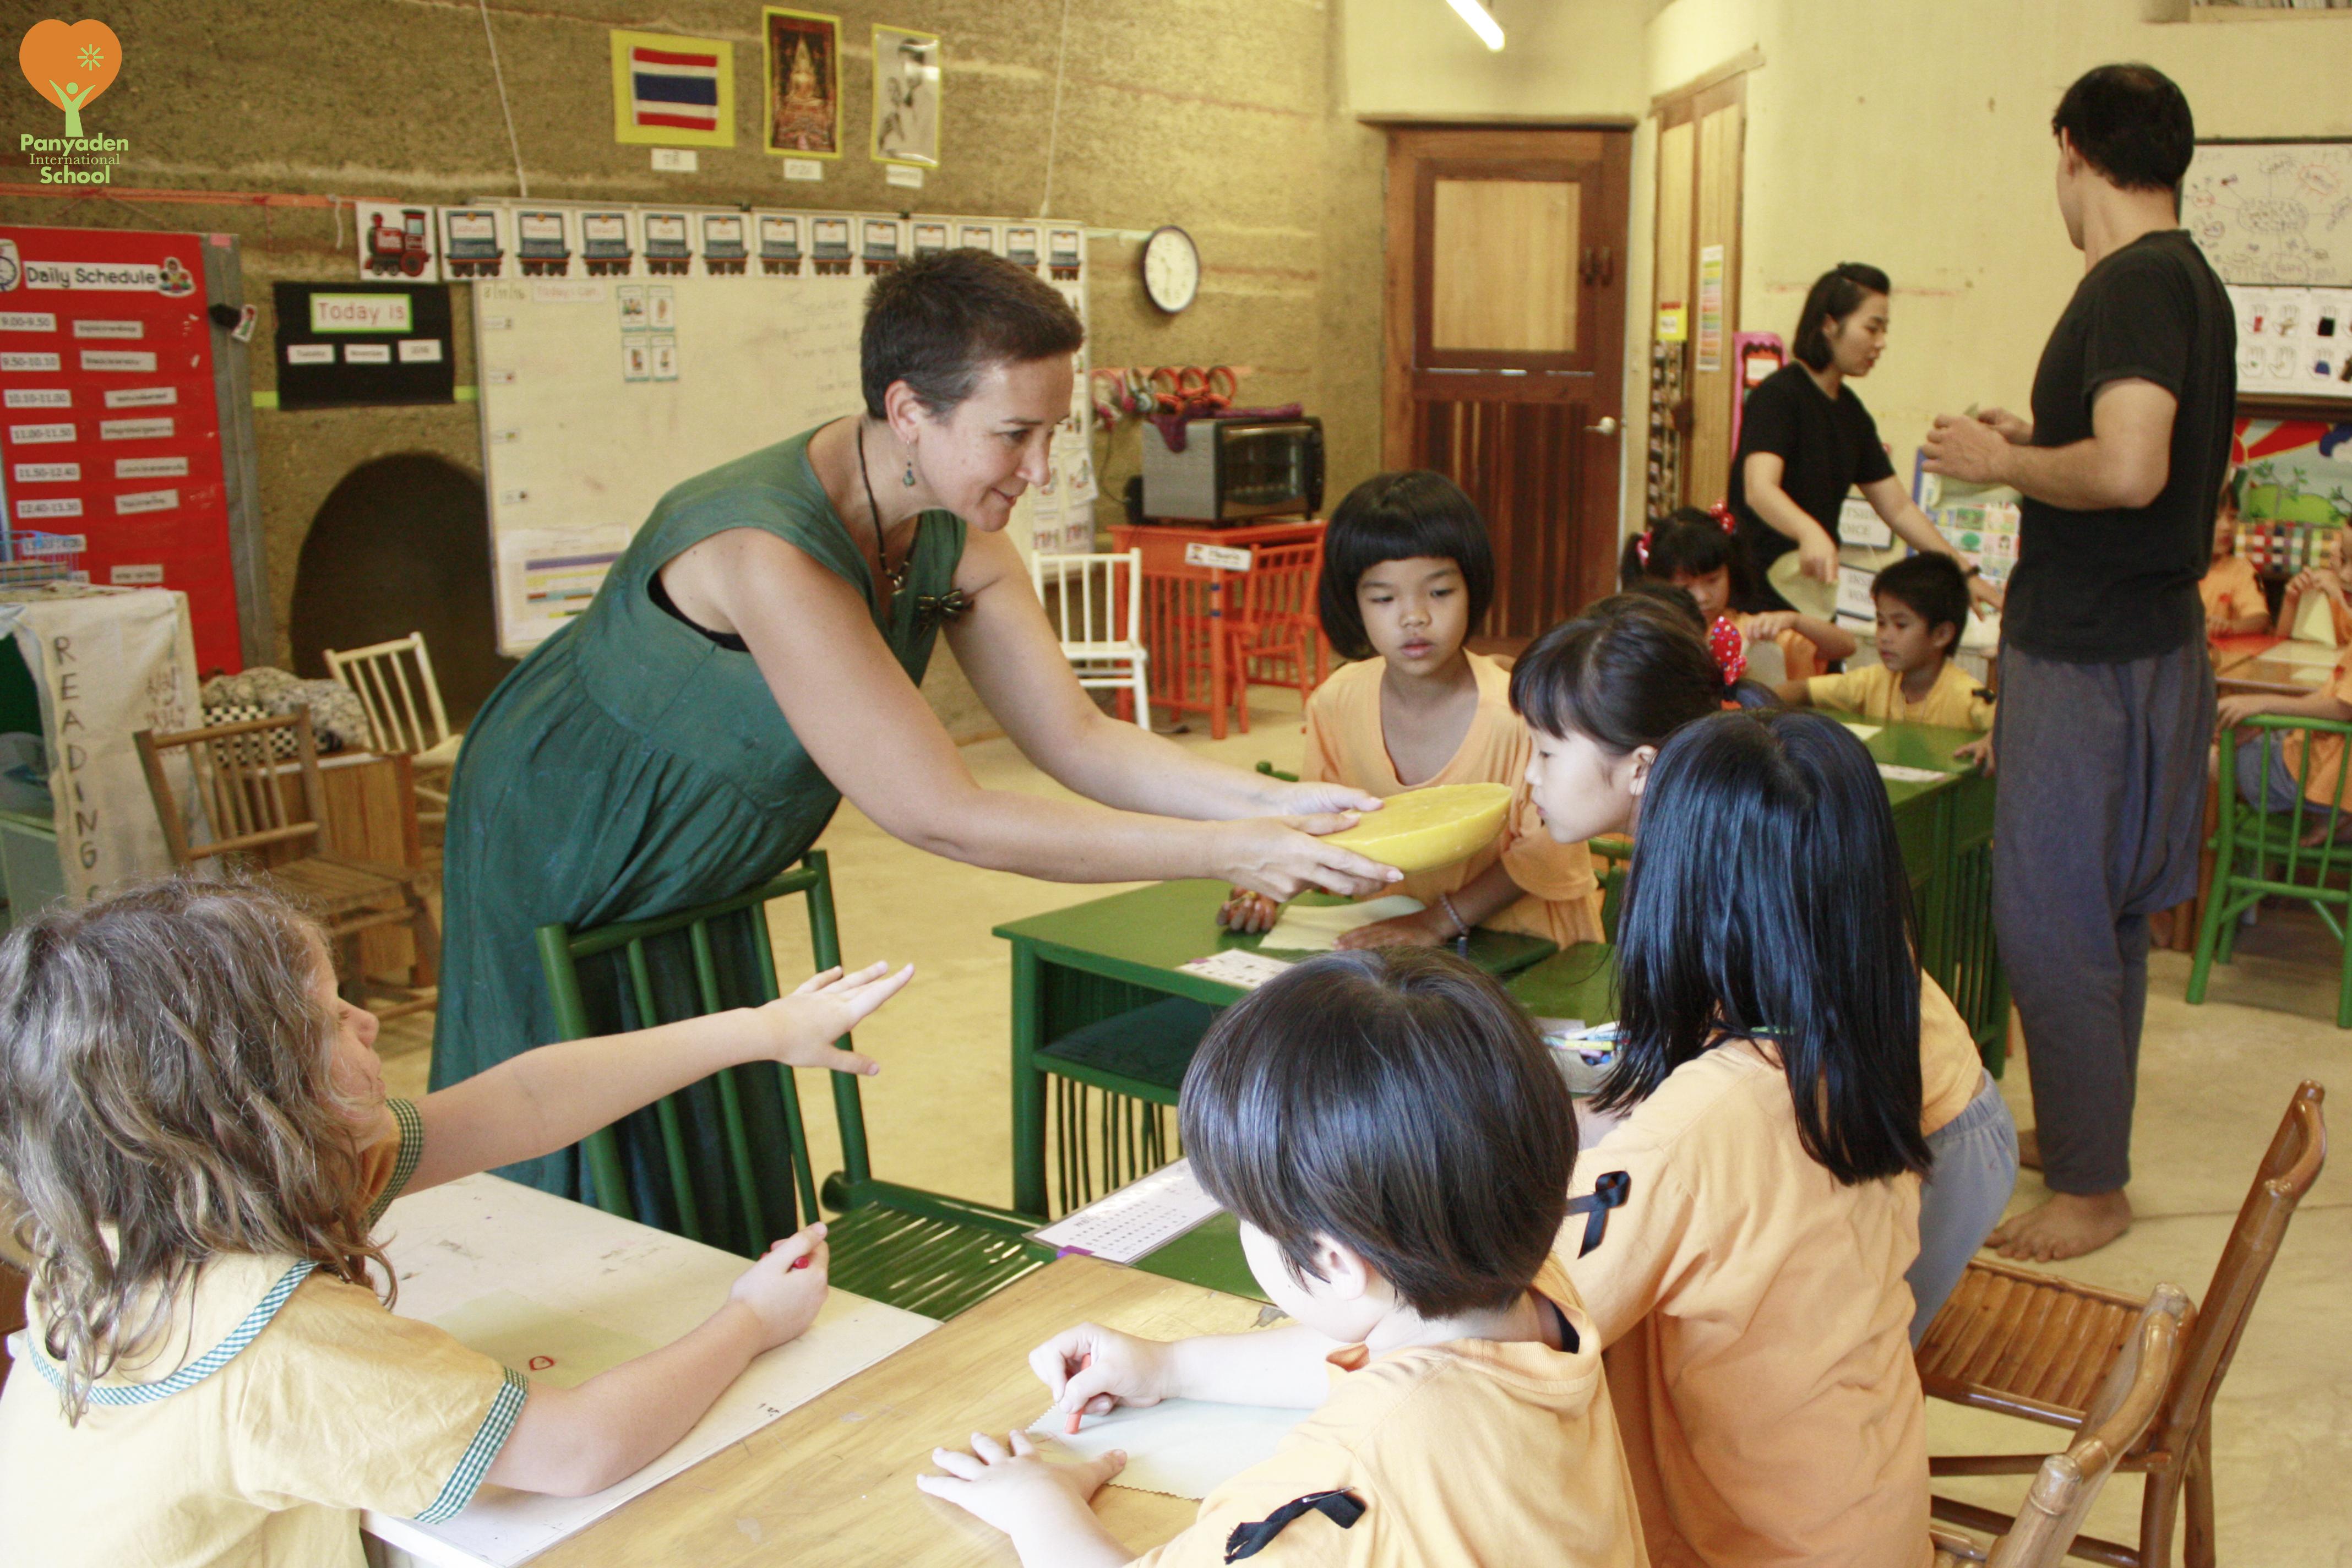 Panyaden parent teachers Year 2 students how to make beeswax fabric